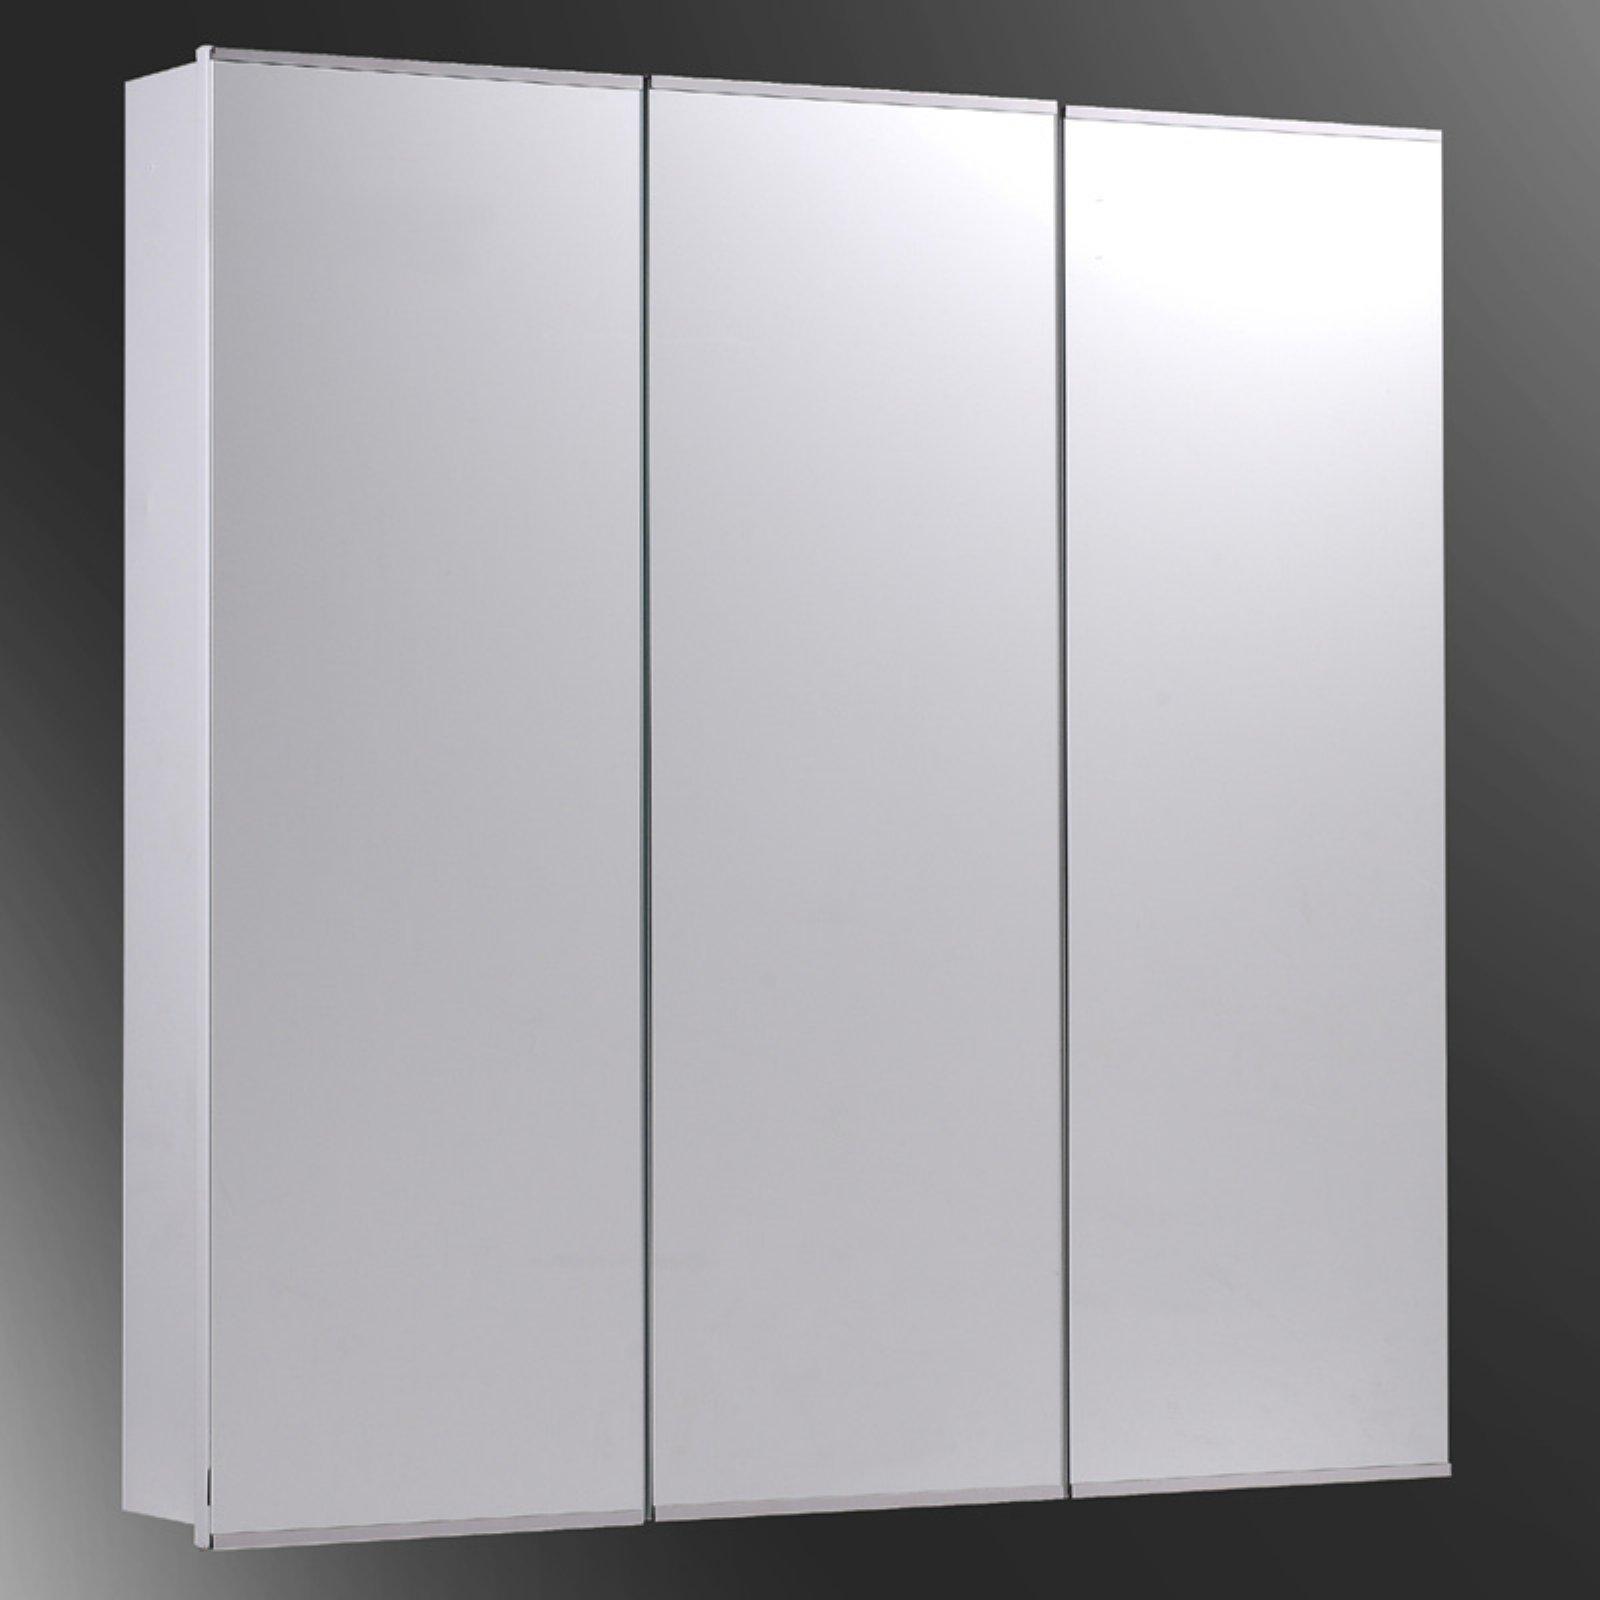 Ketcham 30W x 36H-in. Tri-View Recessed Medicine Cabinet by Ketcham Medicine Cabinets